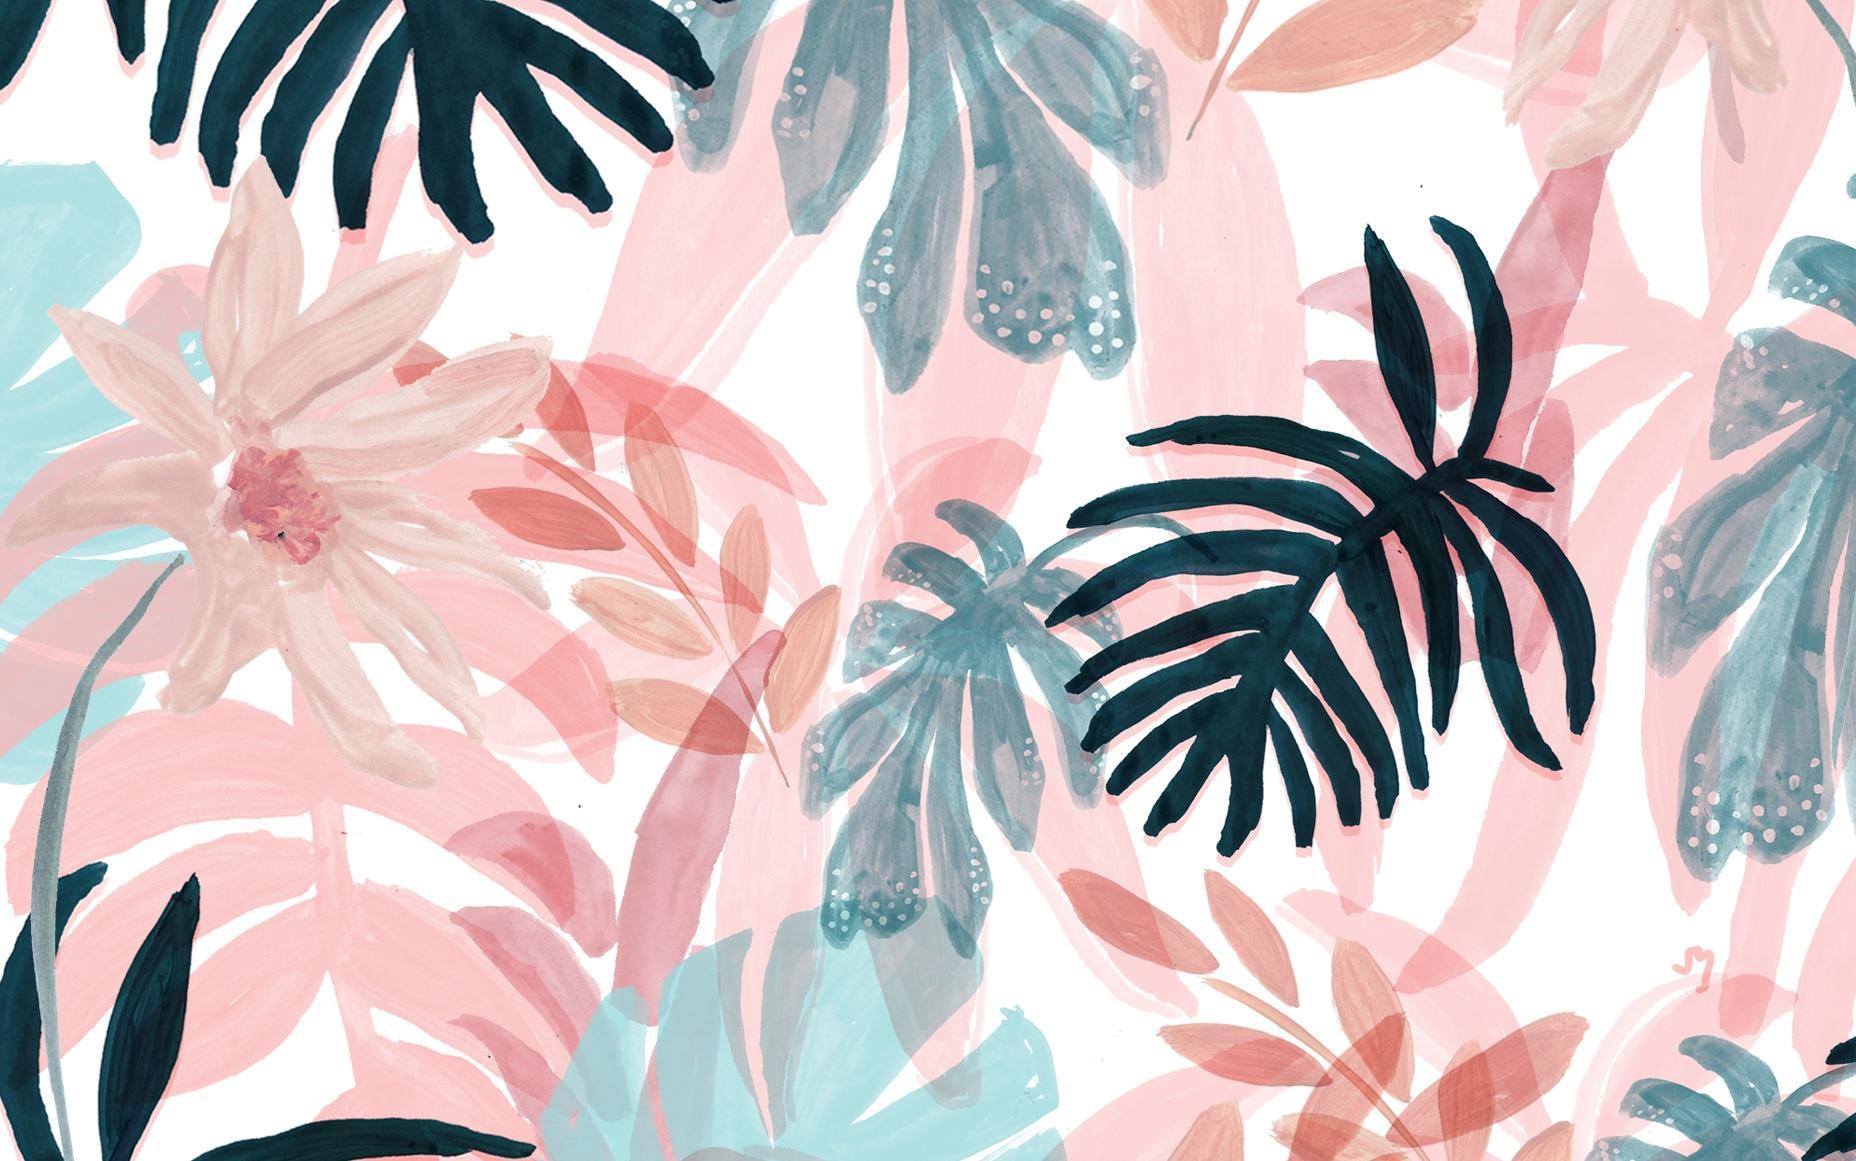 Laptop Pastel Aesthetic Wallpapers Wallpaper Cave